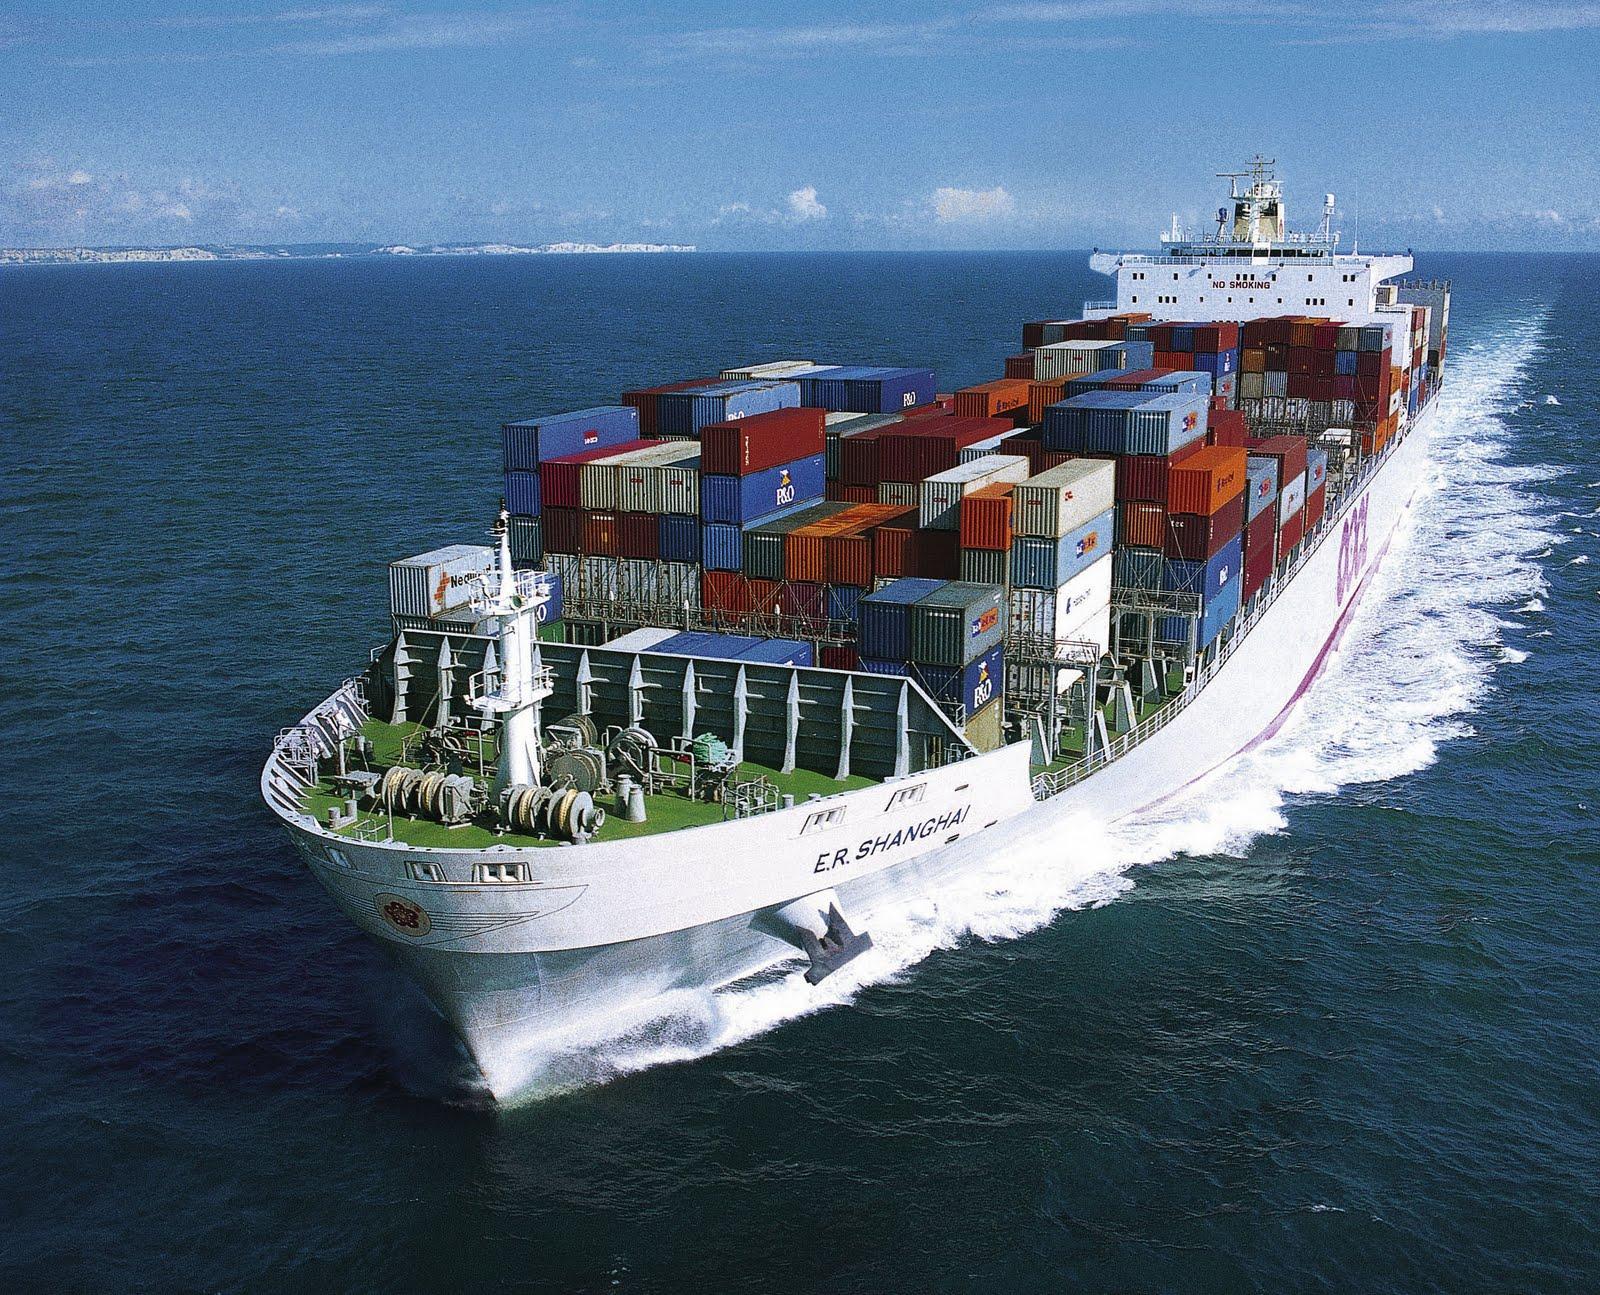 http://2.bp.blogspot.com/-uzeseWRBzlA/TbvcJIrrP4I/AAAAAAAAAMo/KmXzbNMjH6Y/s1600/cargo-ship.jpg